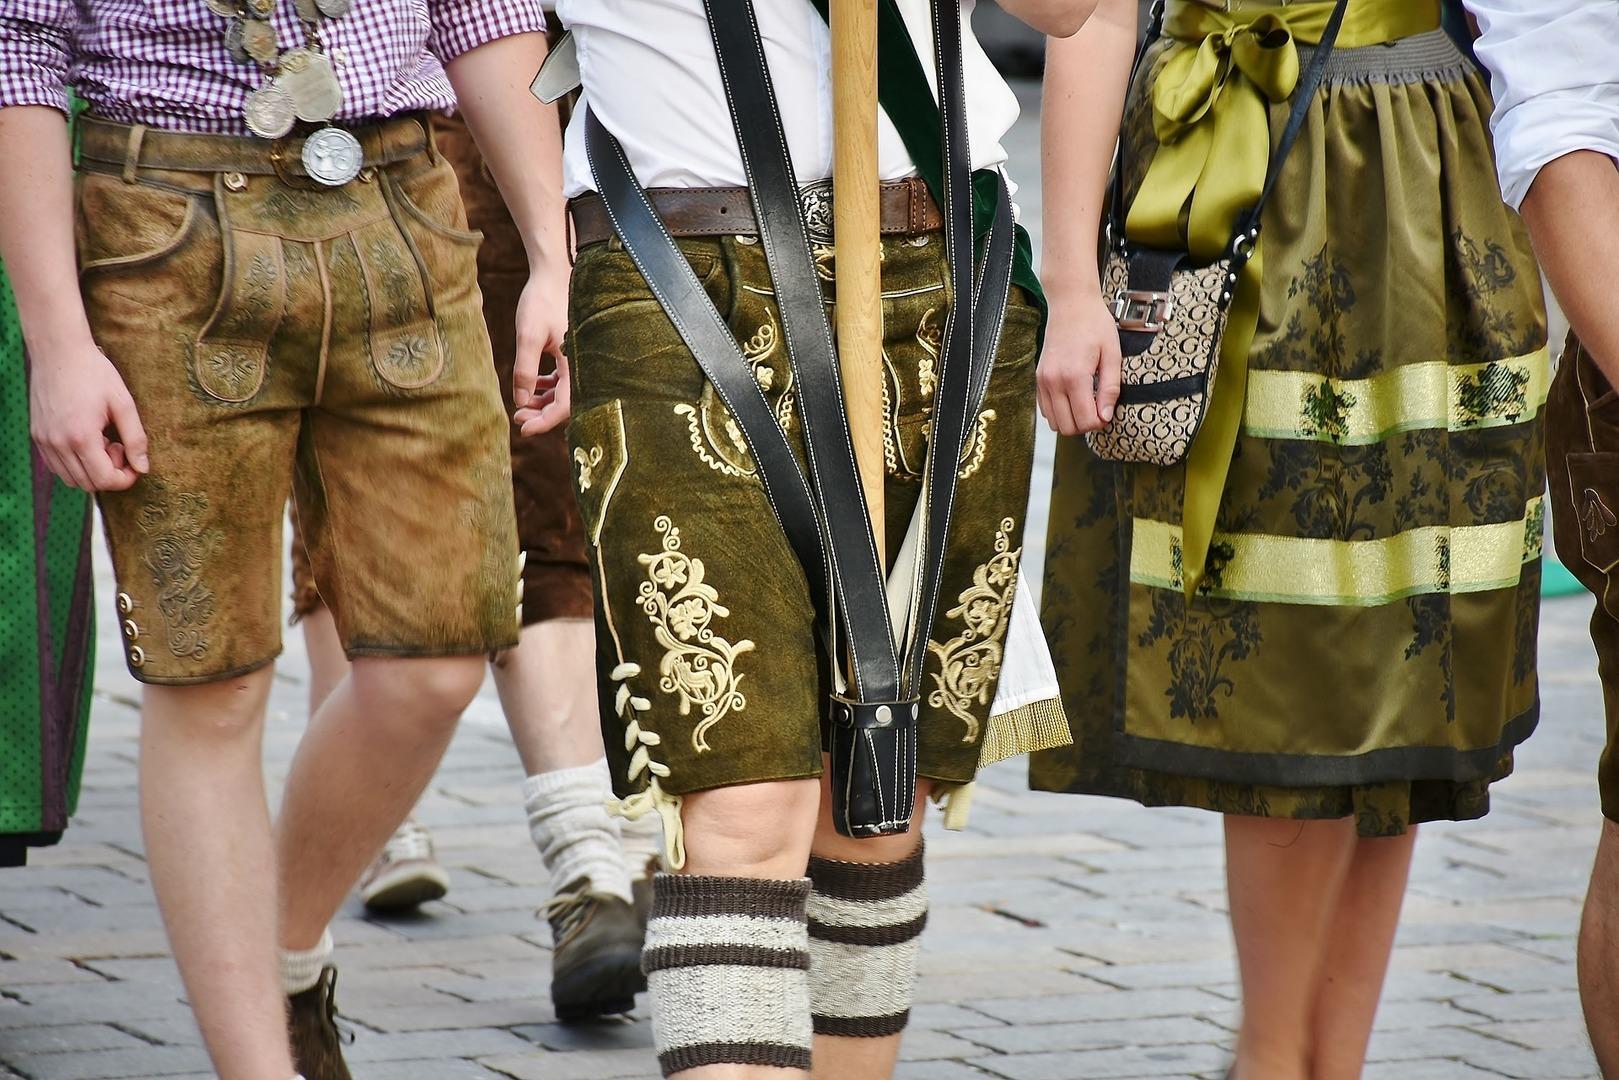 116th German Fest